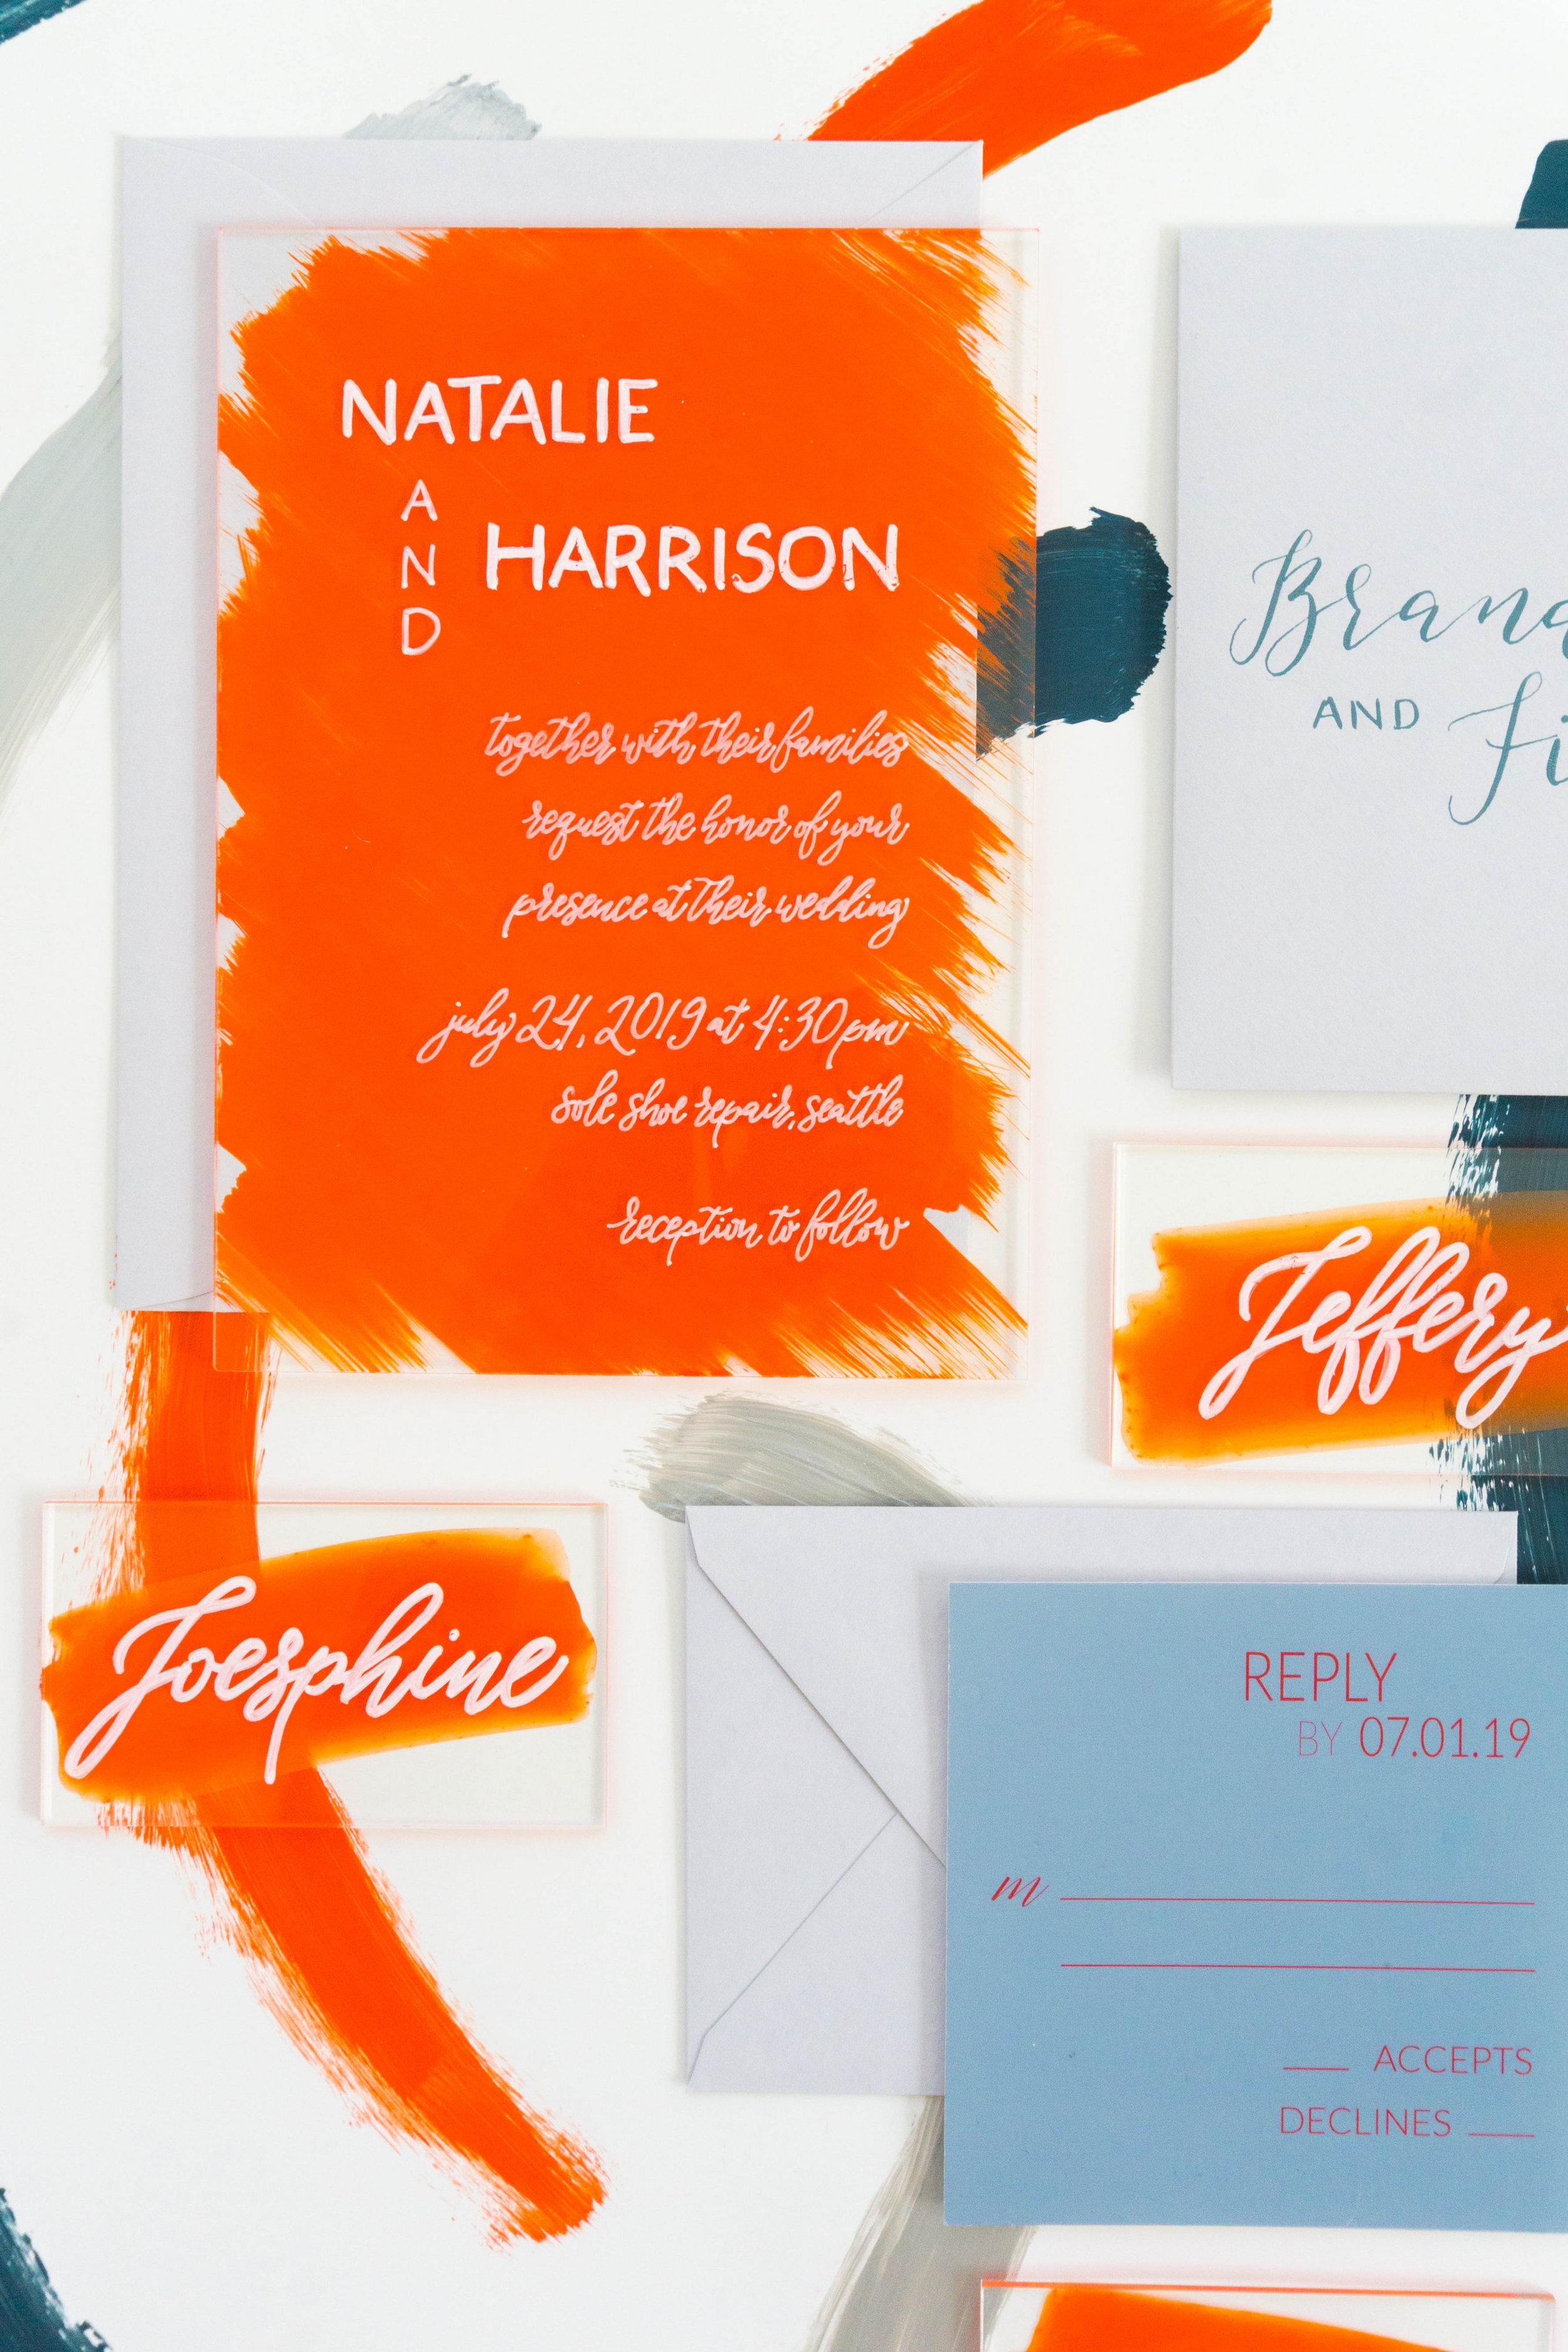 love-fern-design-studio-custom-wedding-invitations-for-the-modern-couple-modern-calligraphy-in-seattle-washington-custom-wedding-stationery-orange-acrylic-invitation-suite-acrylic-menu-and-place-cards